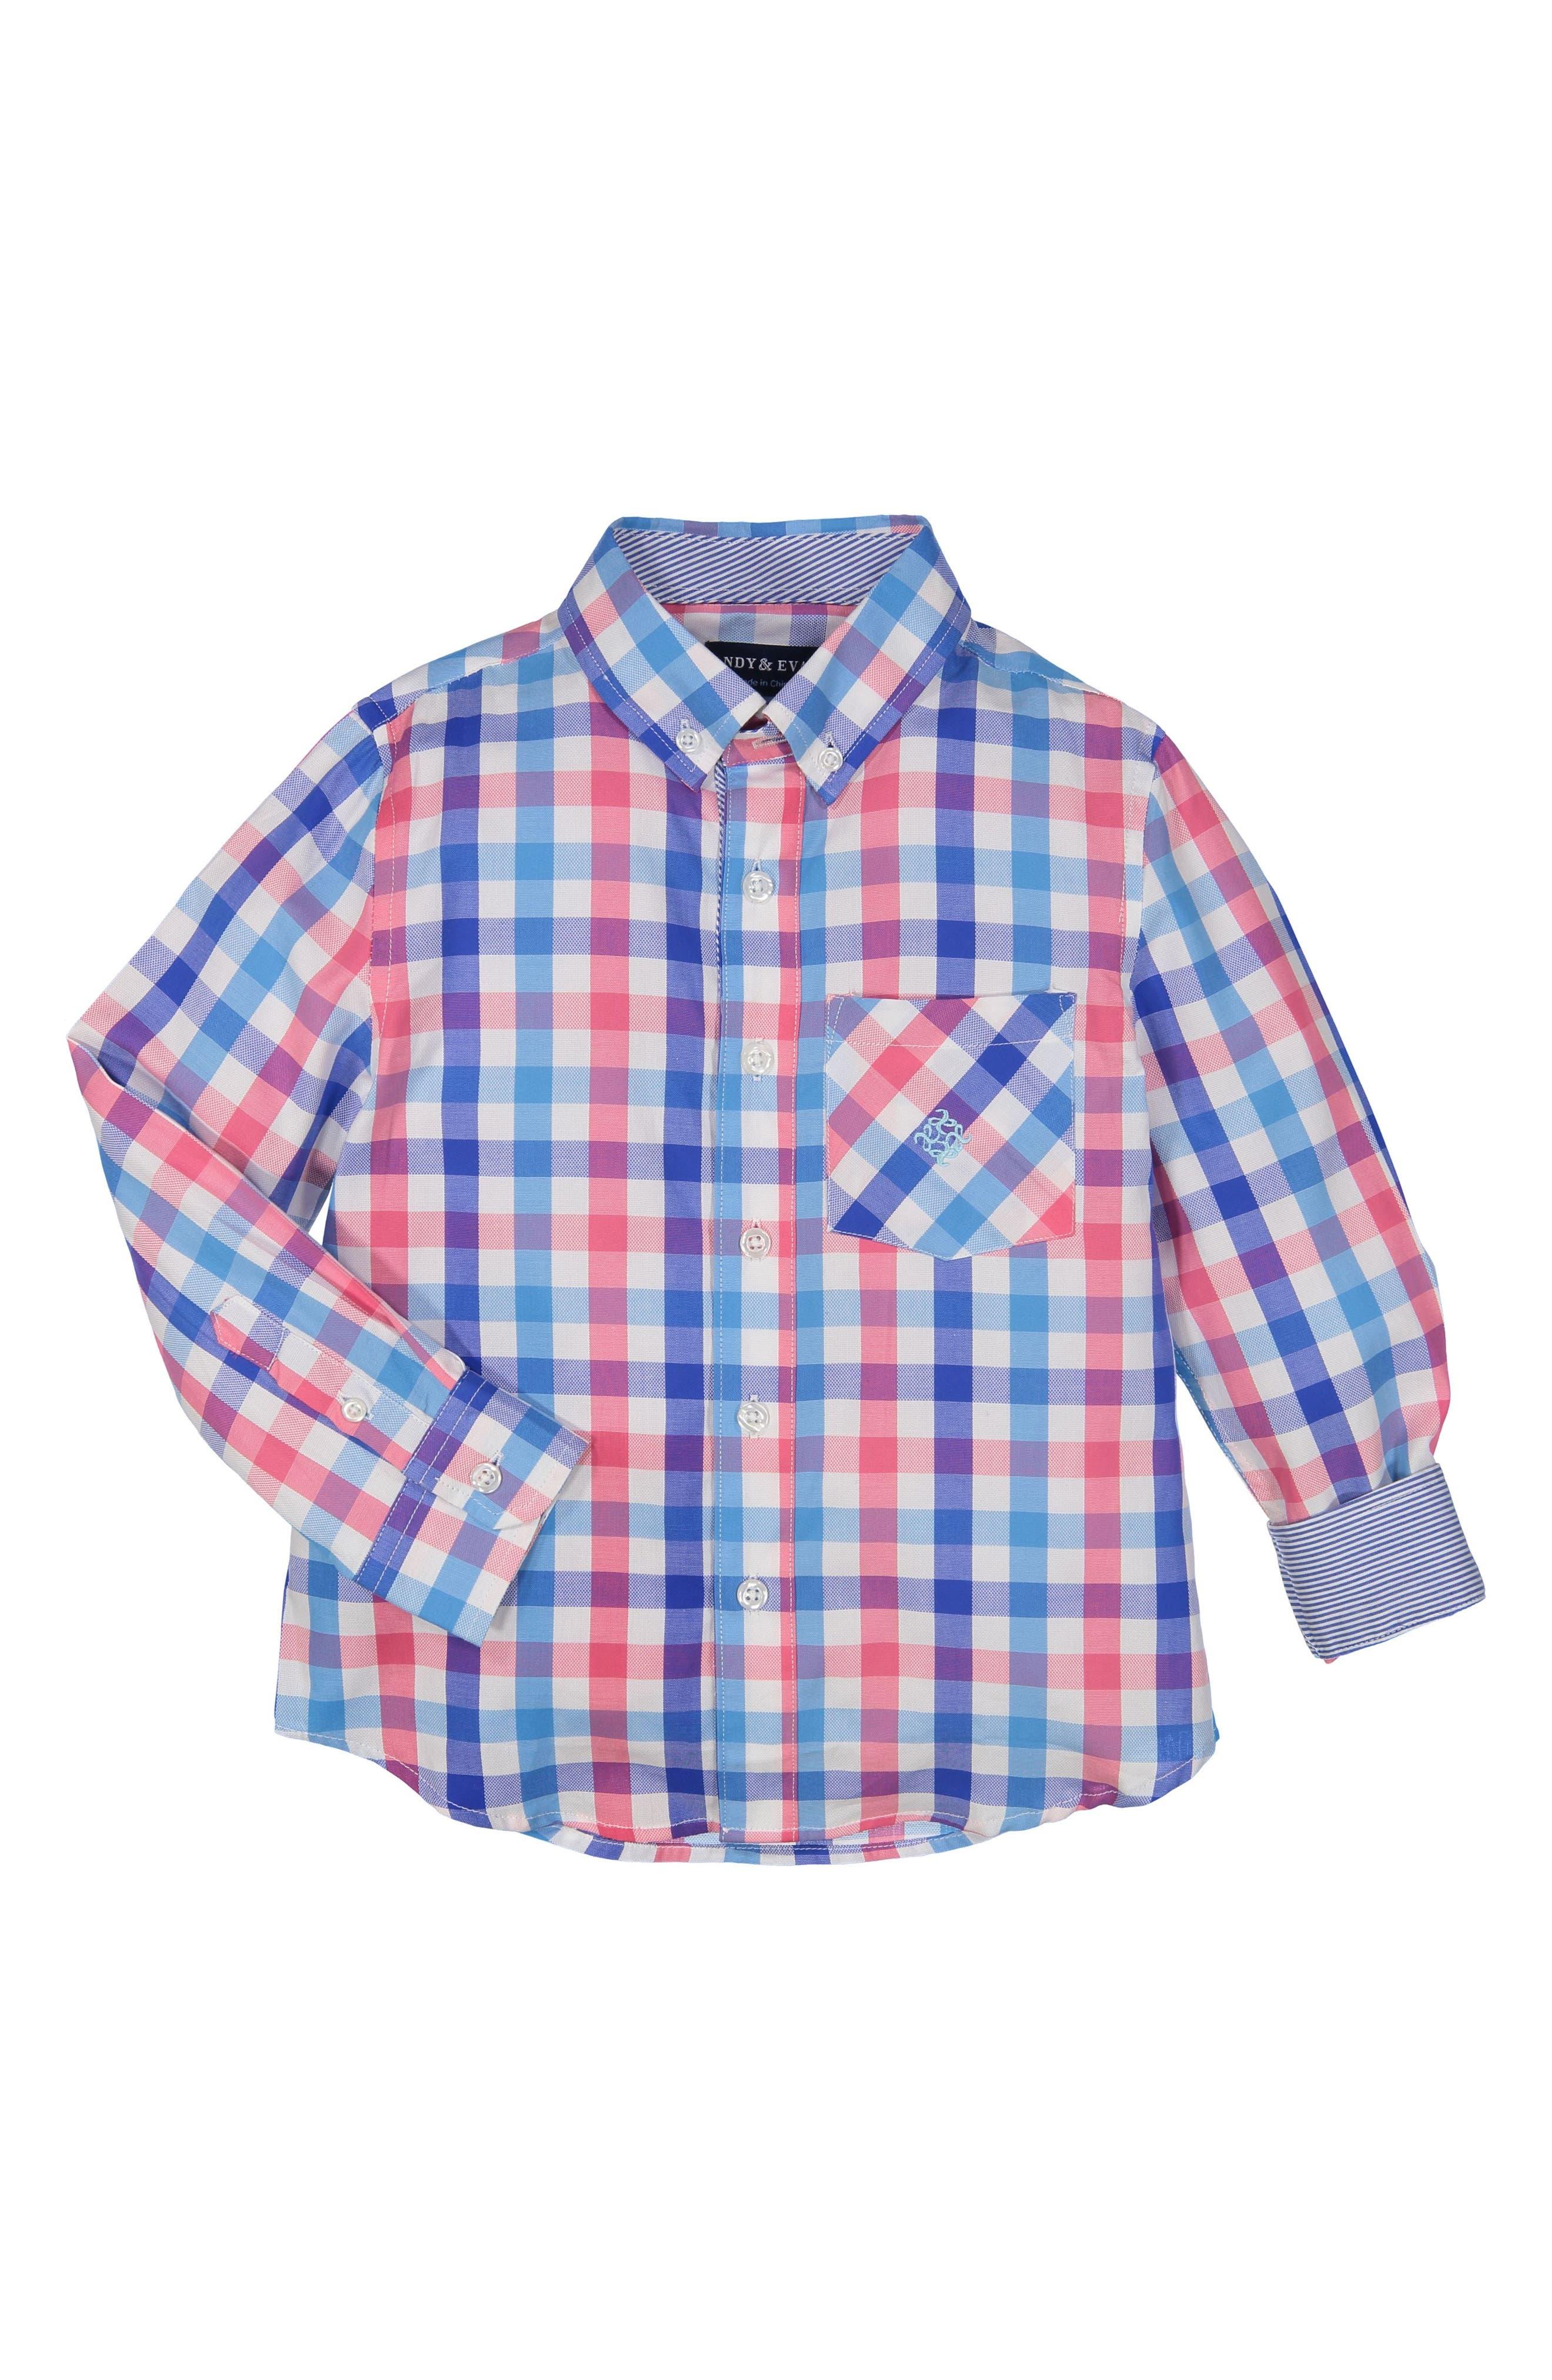 Main Image - Andy & Evan Check Woven Shirt (Toddler Boys & Little Boys)